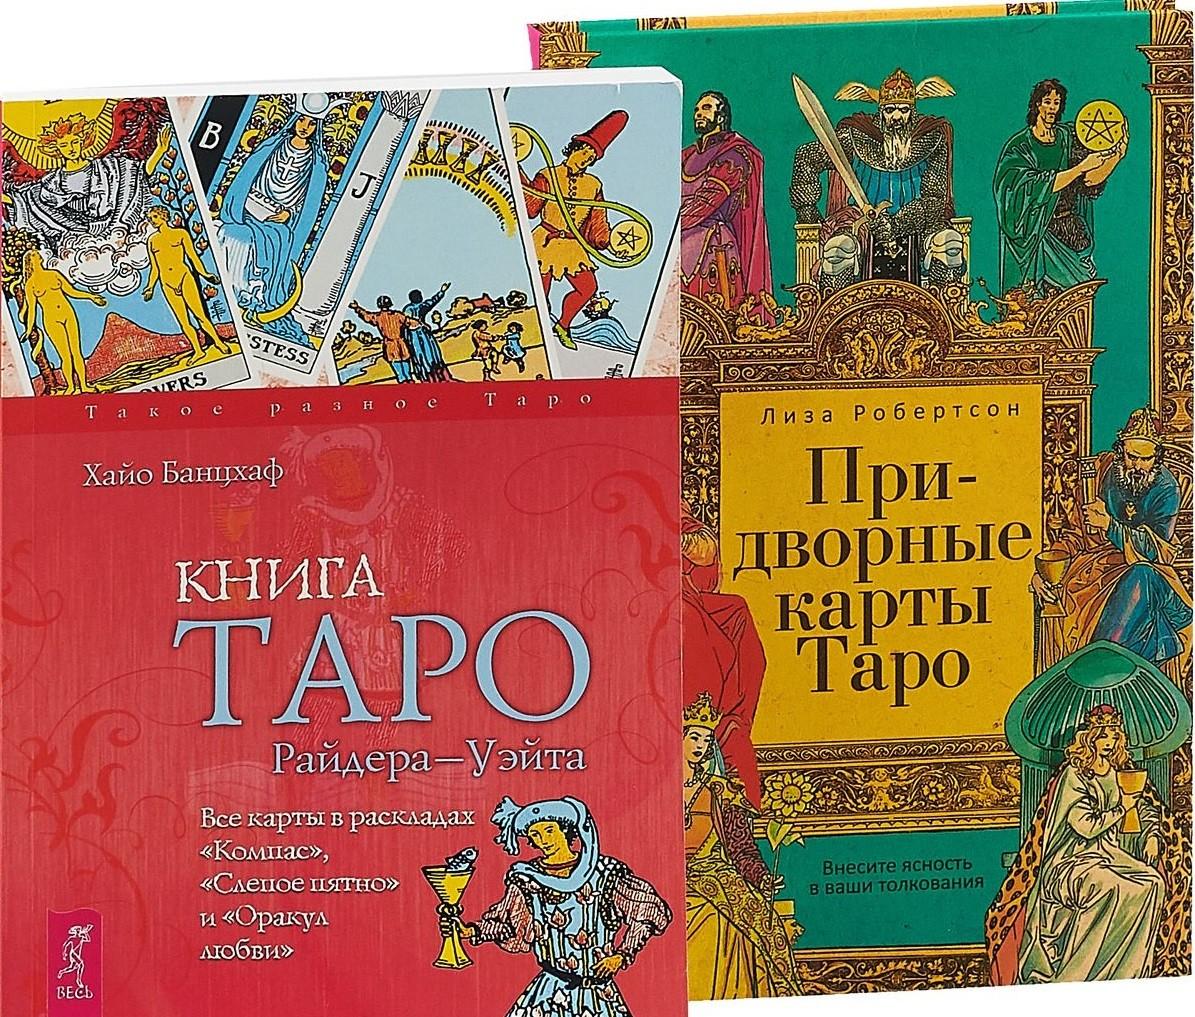 Придворные карты таро. книга таро Райдера-Уэйта (Комплект из 2 книг)